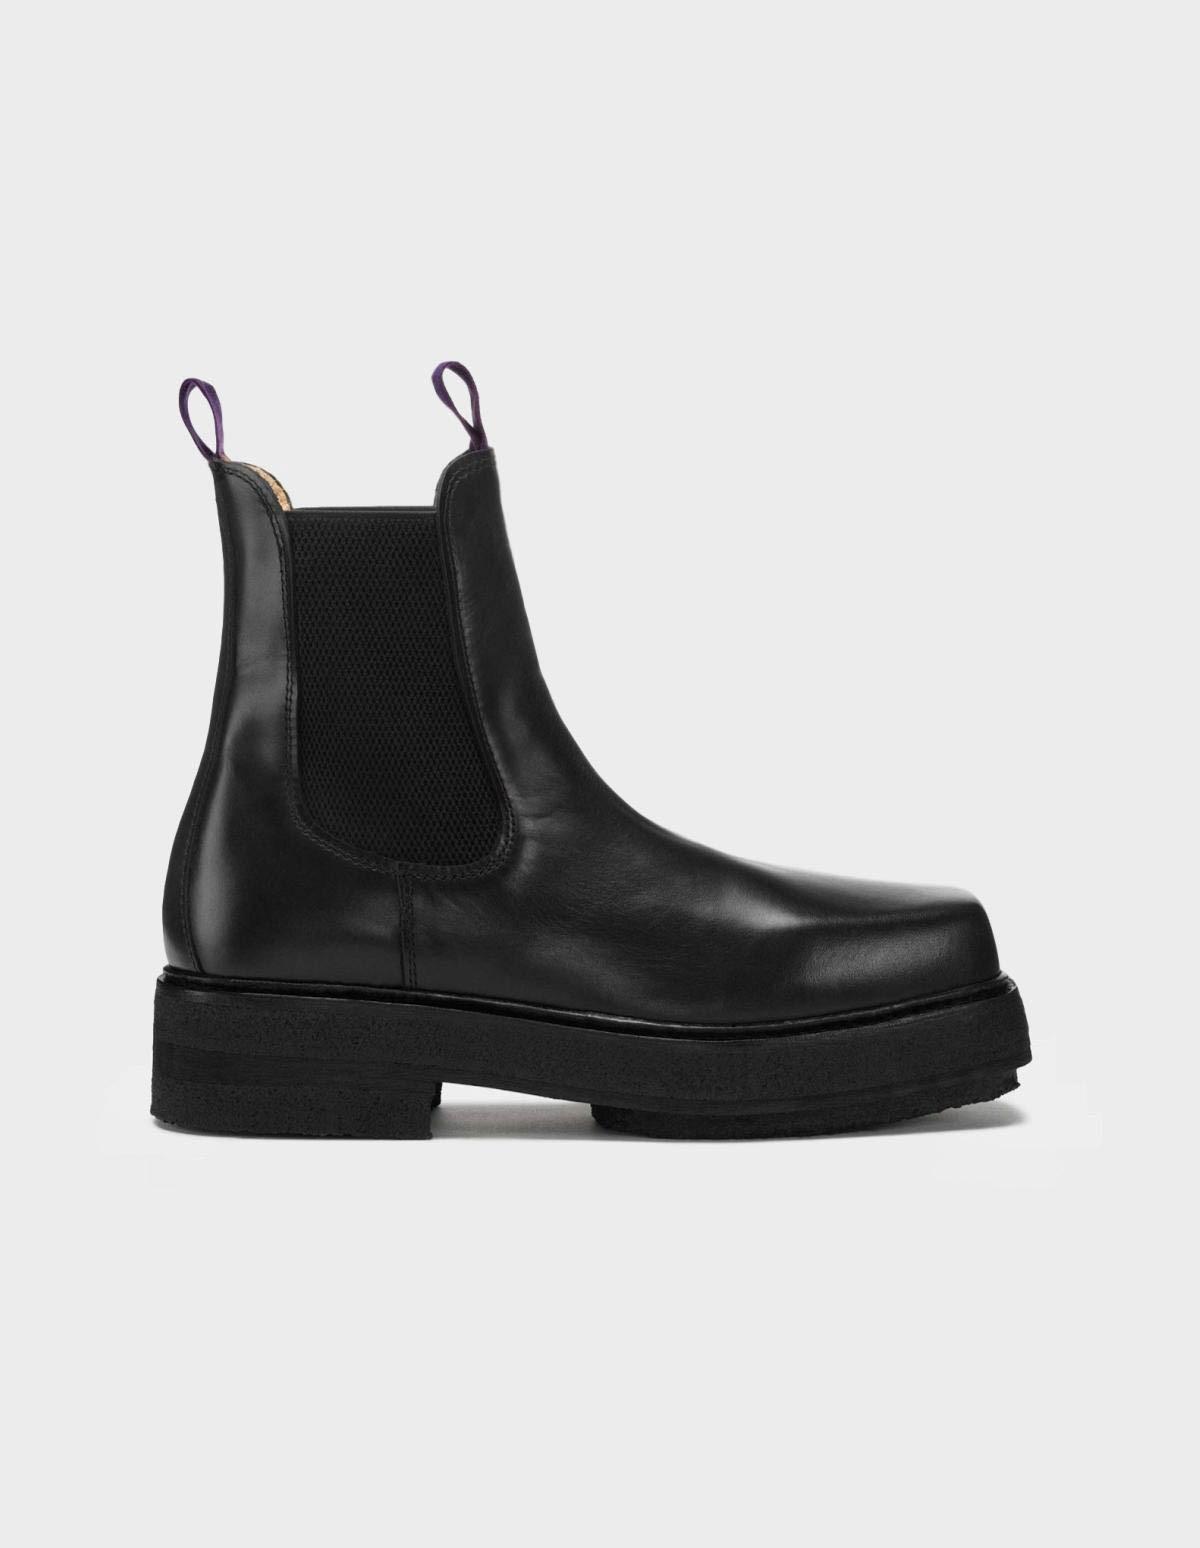 Eytys Ortega Leather in Black